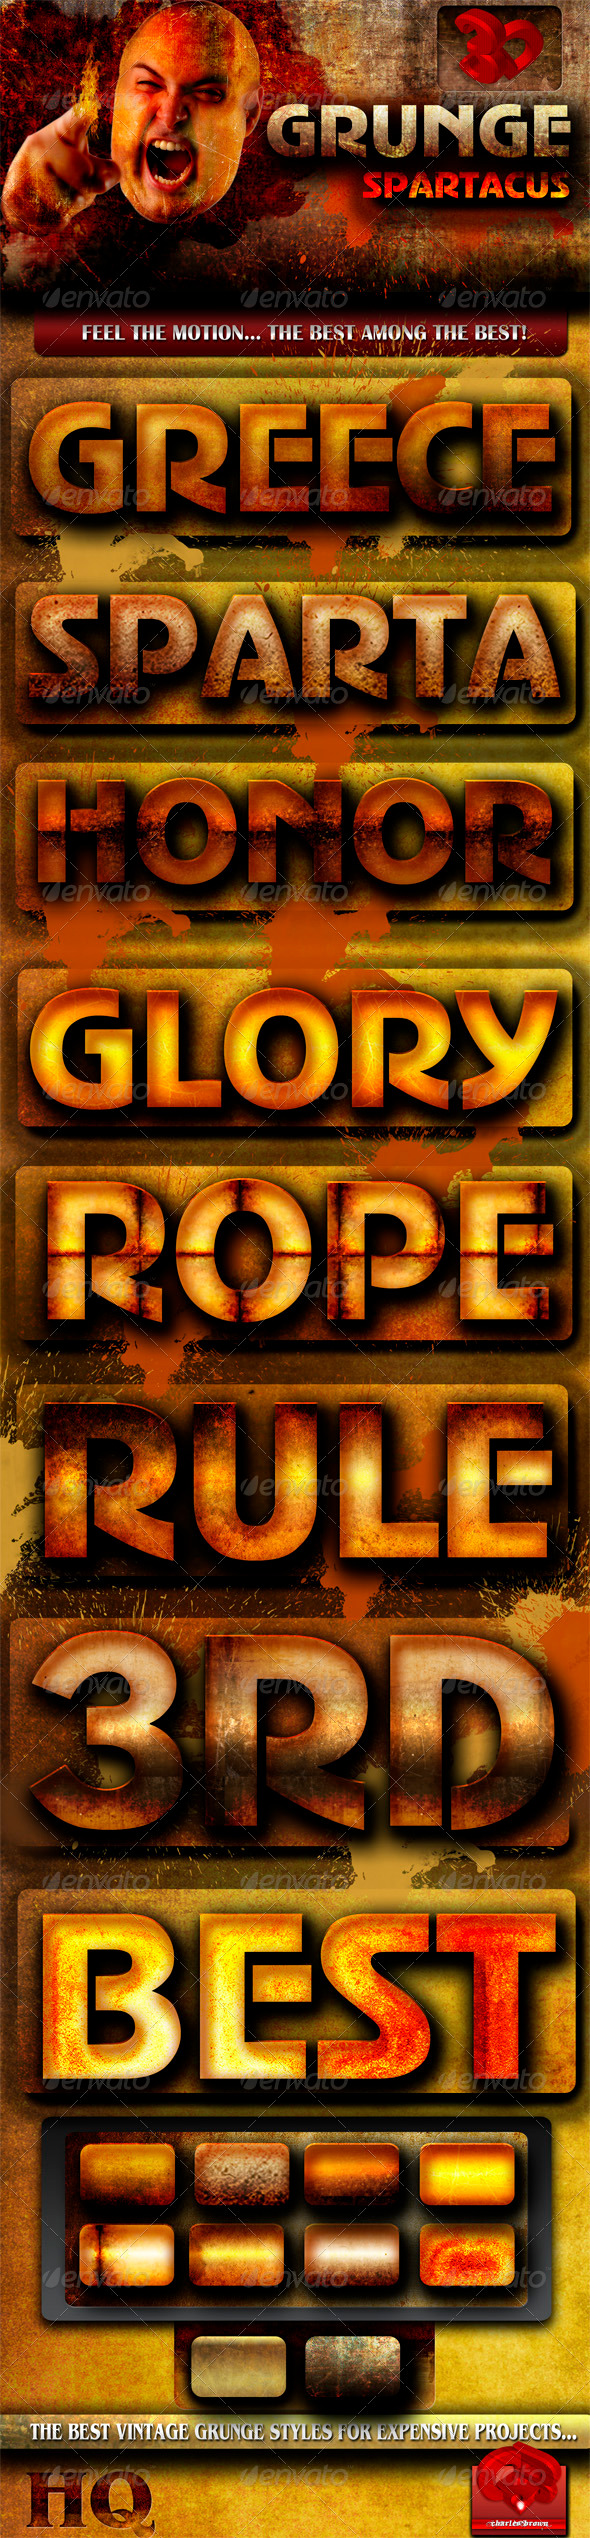 GraphicRiver Grunge Spartacus Text Styles 736485